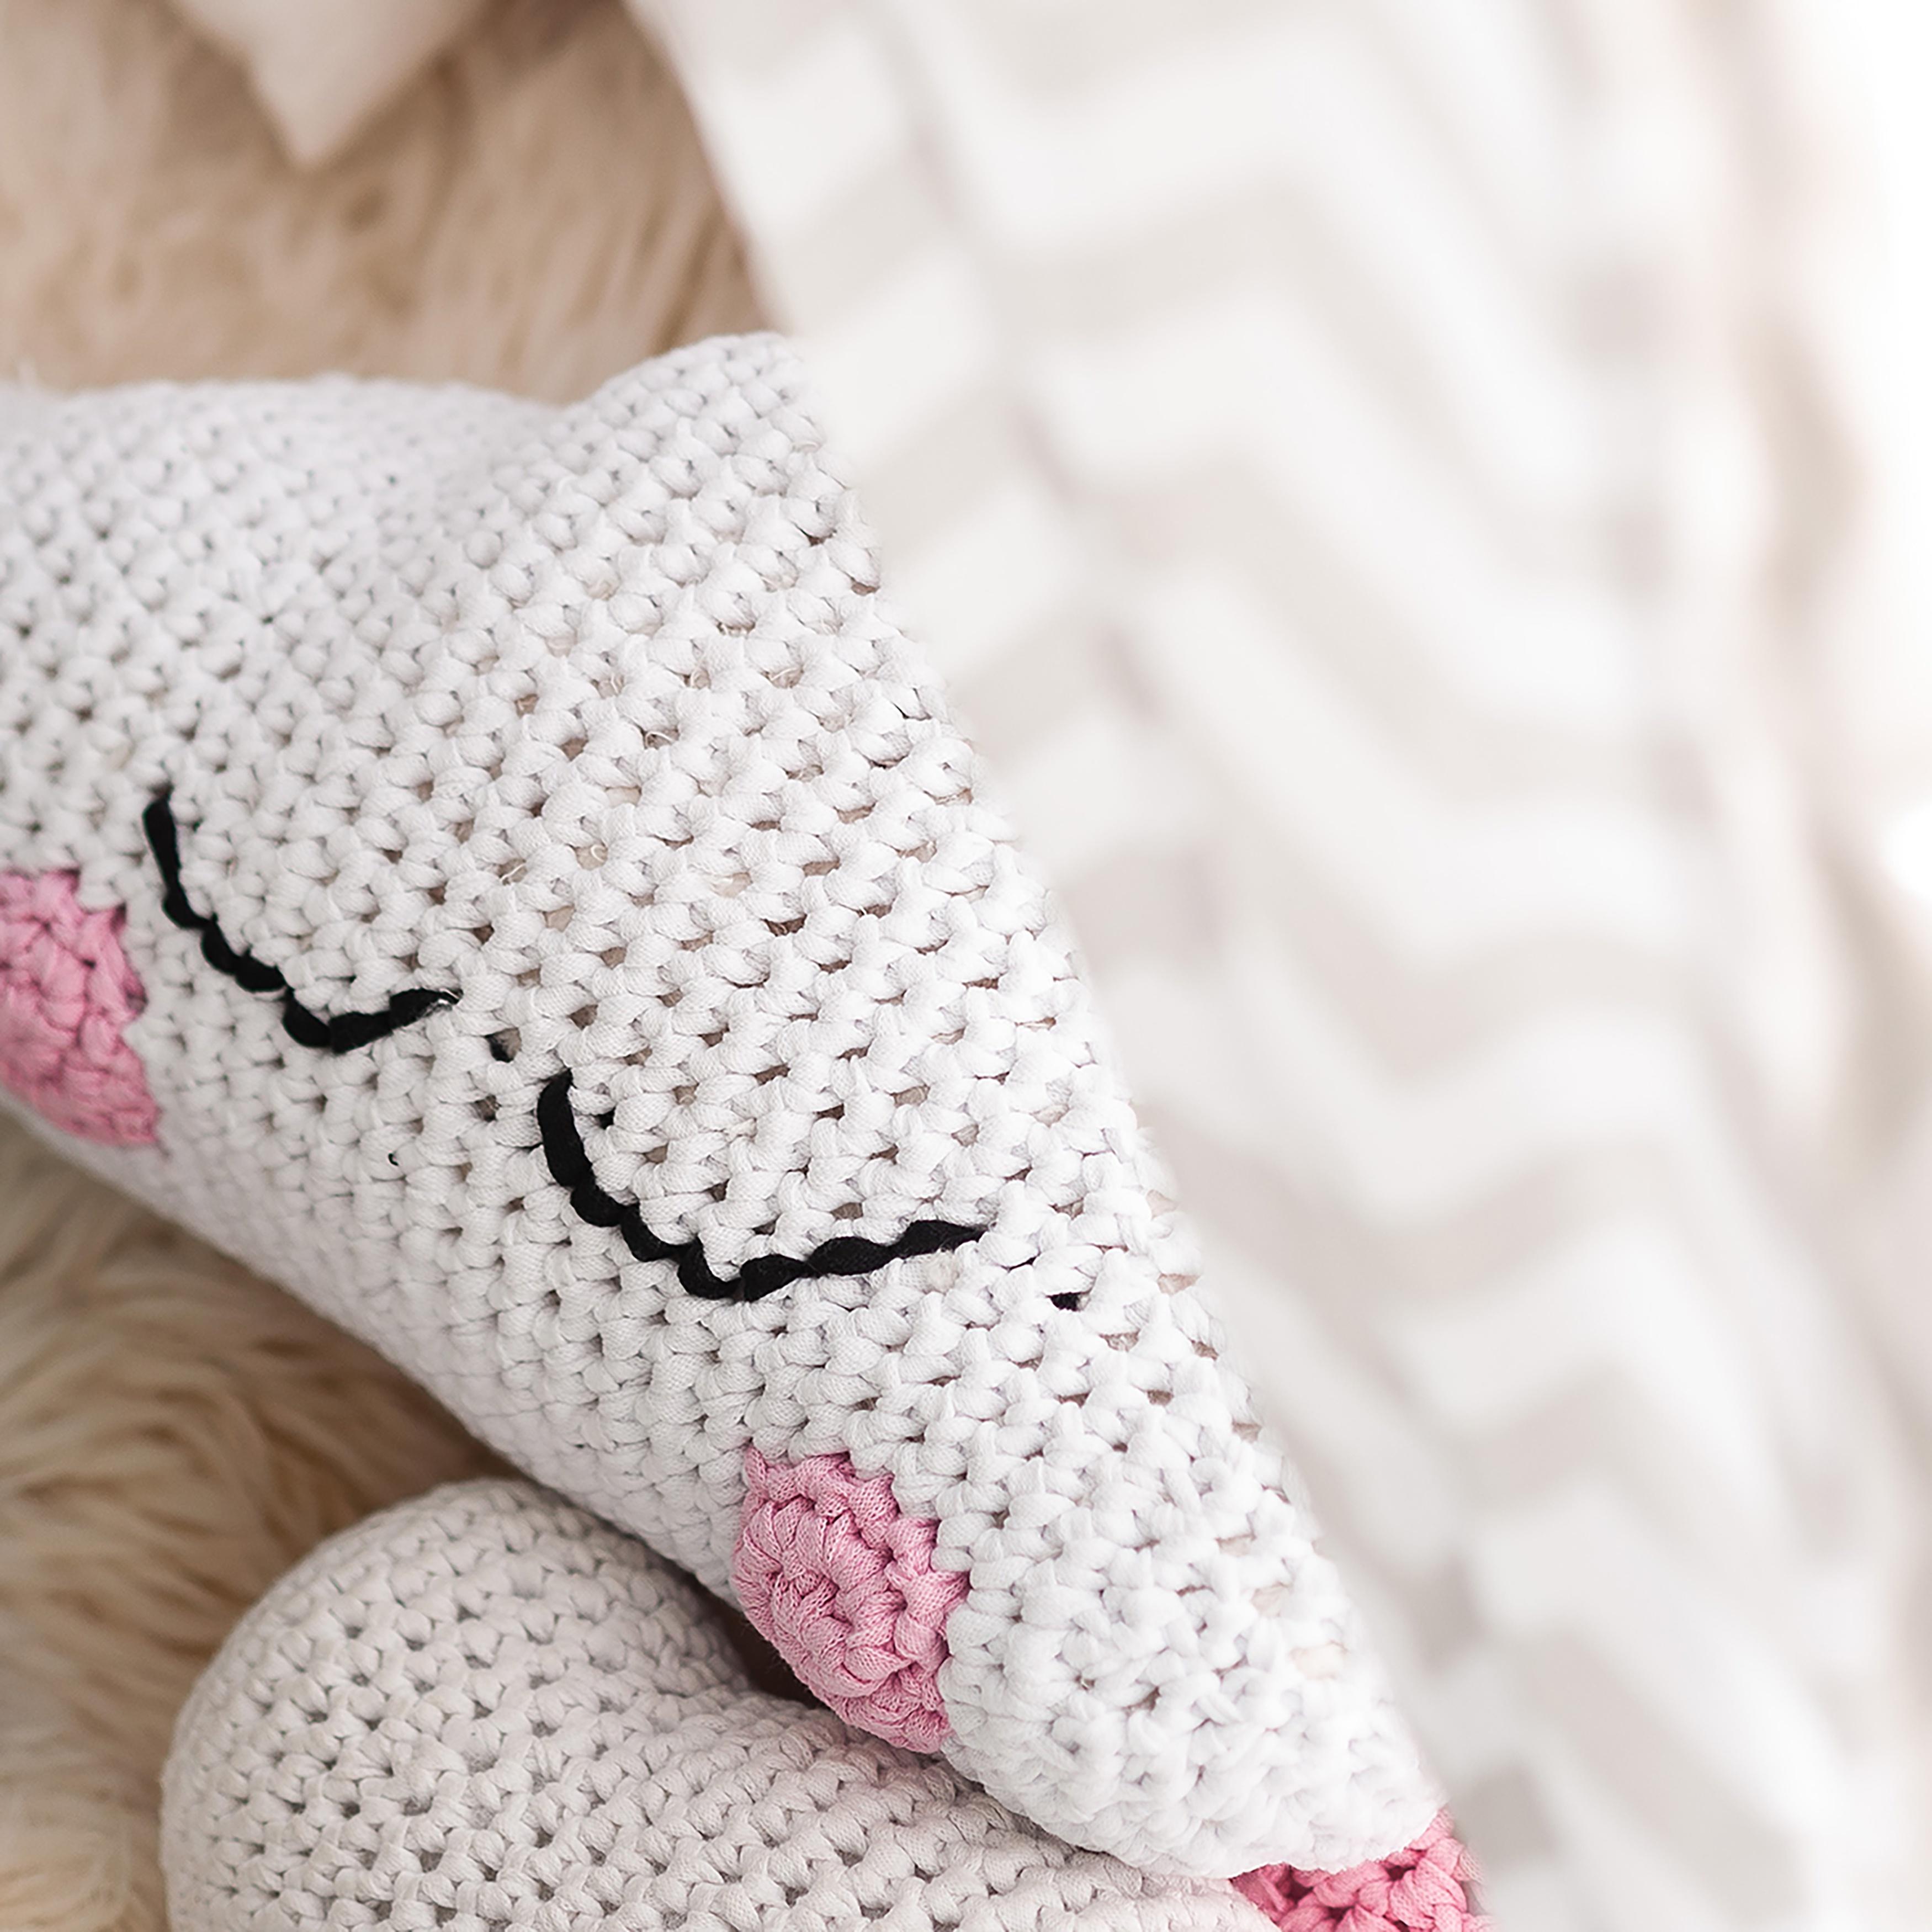 Hoooked Crochet Cushion Kit W/RibbonXL-Dream Cloud